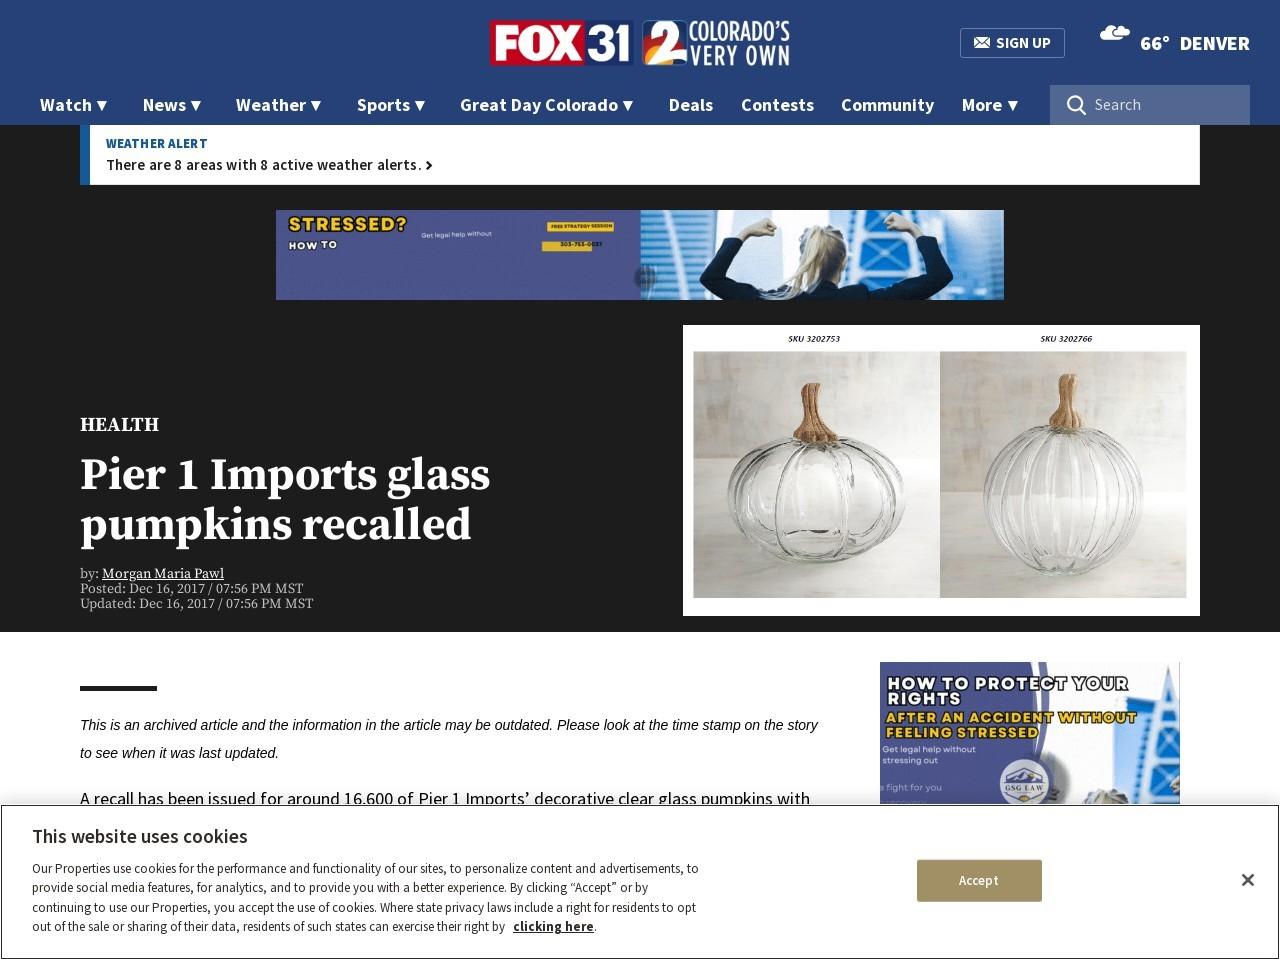 Pier 1 Imports glass pumpkins recalled